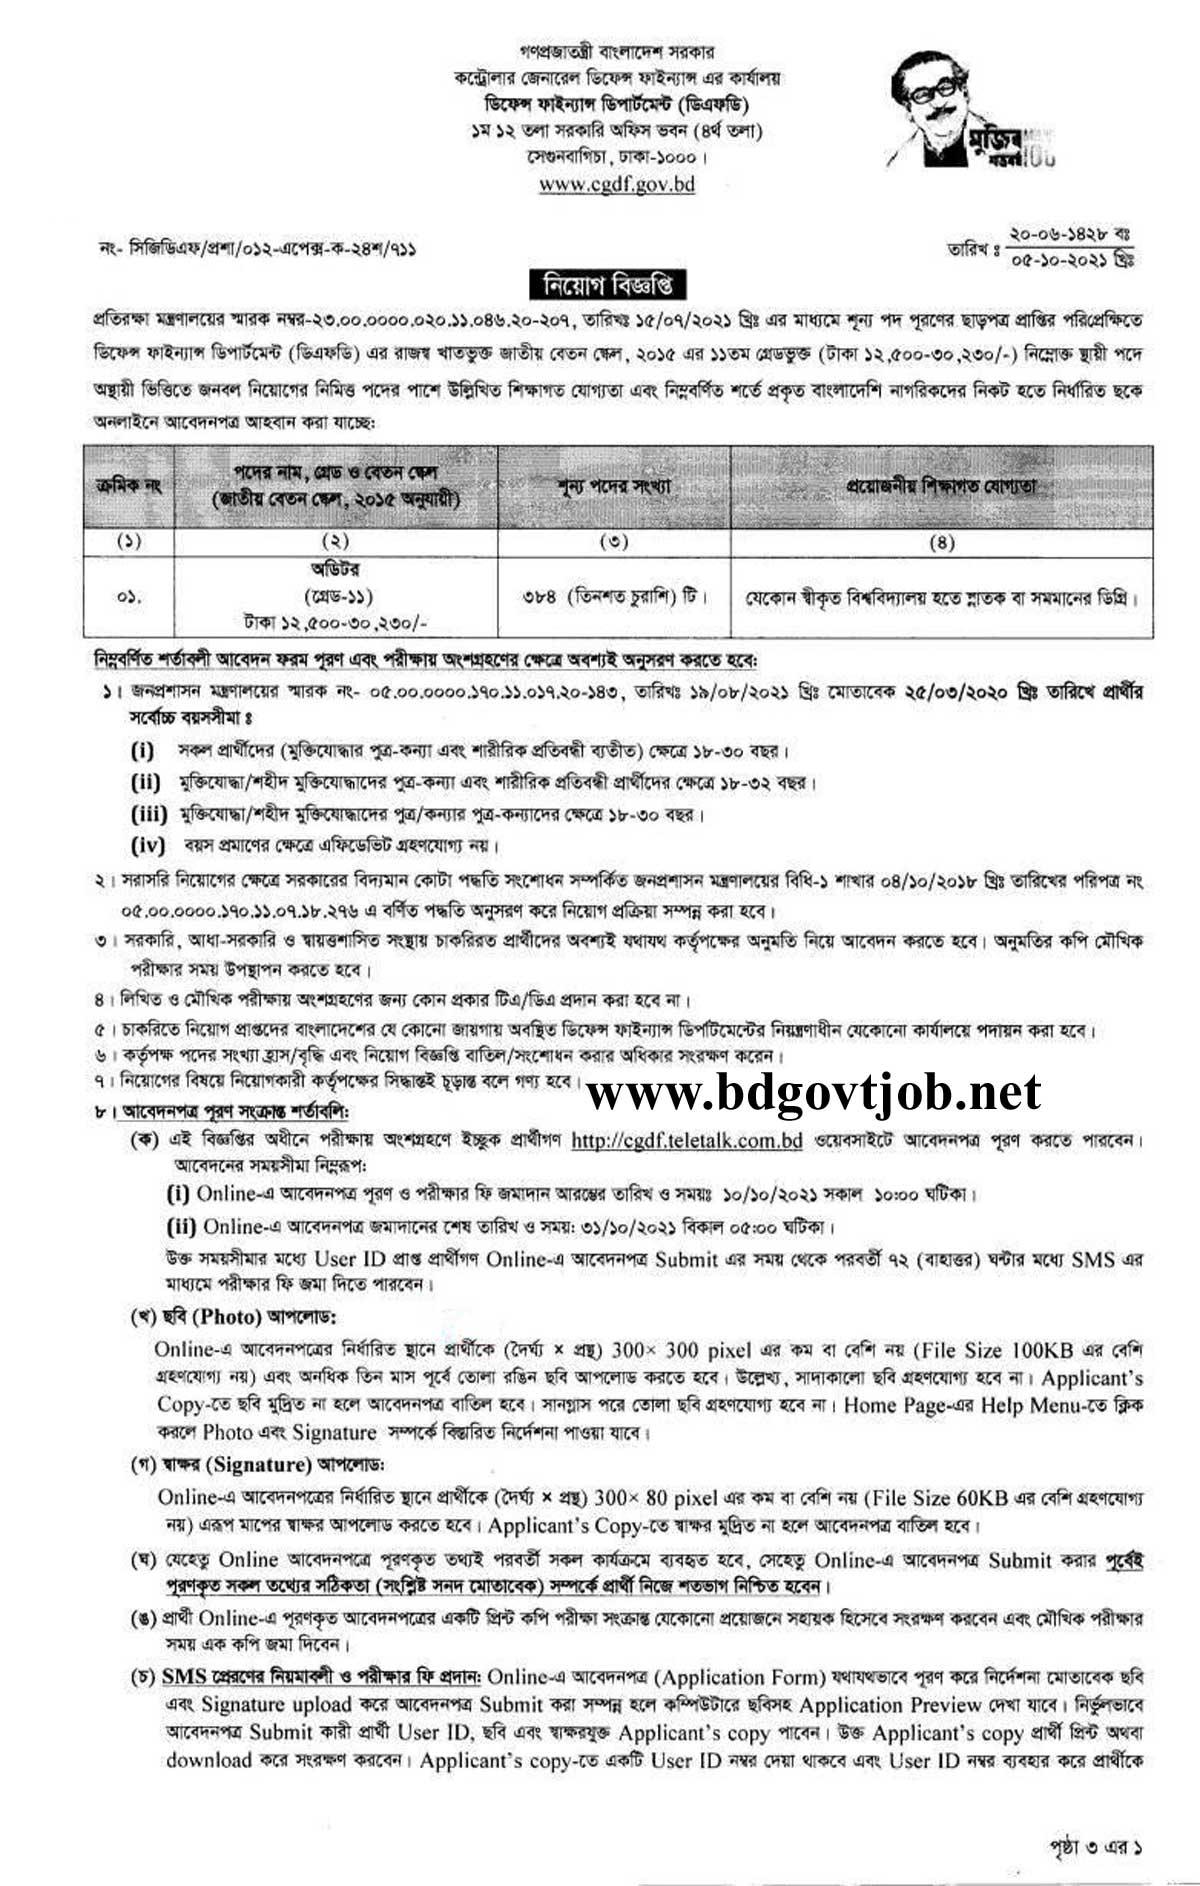 CGDF Job Circular 2021